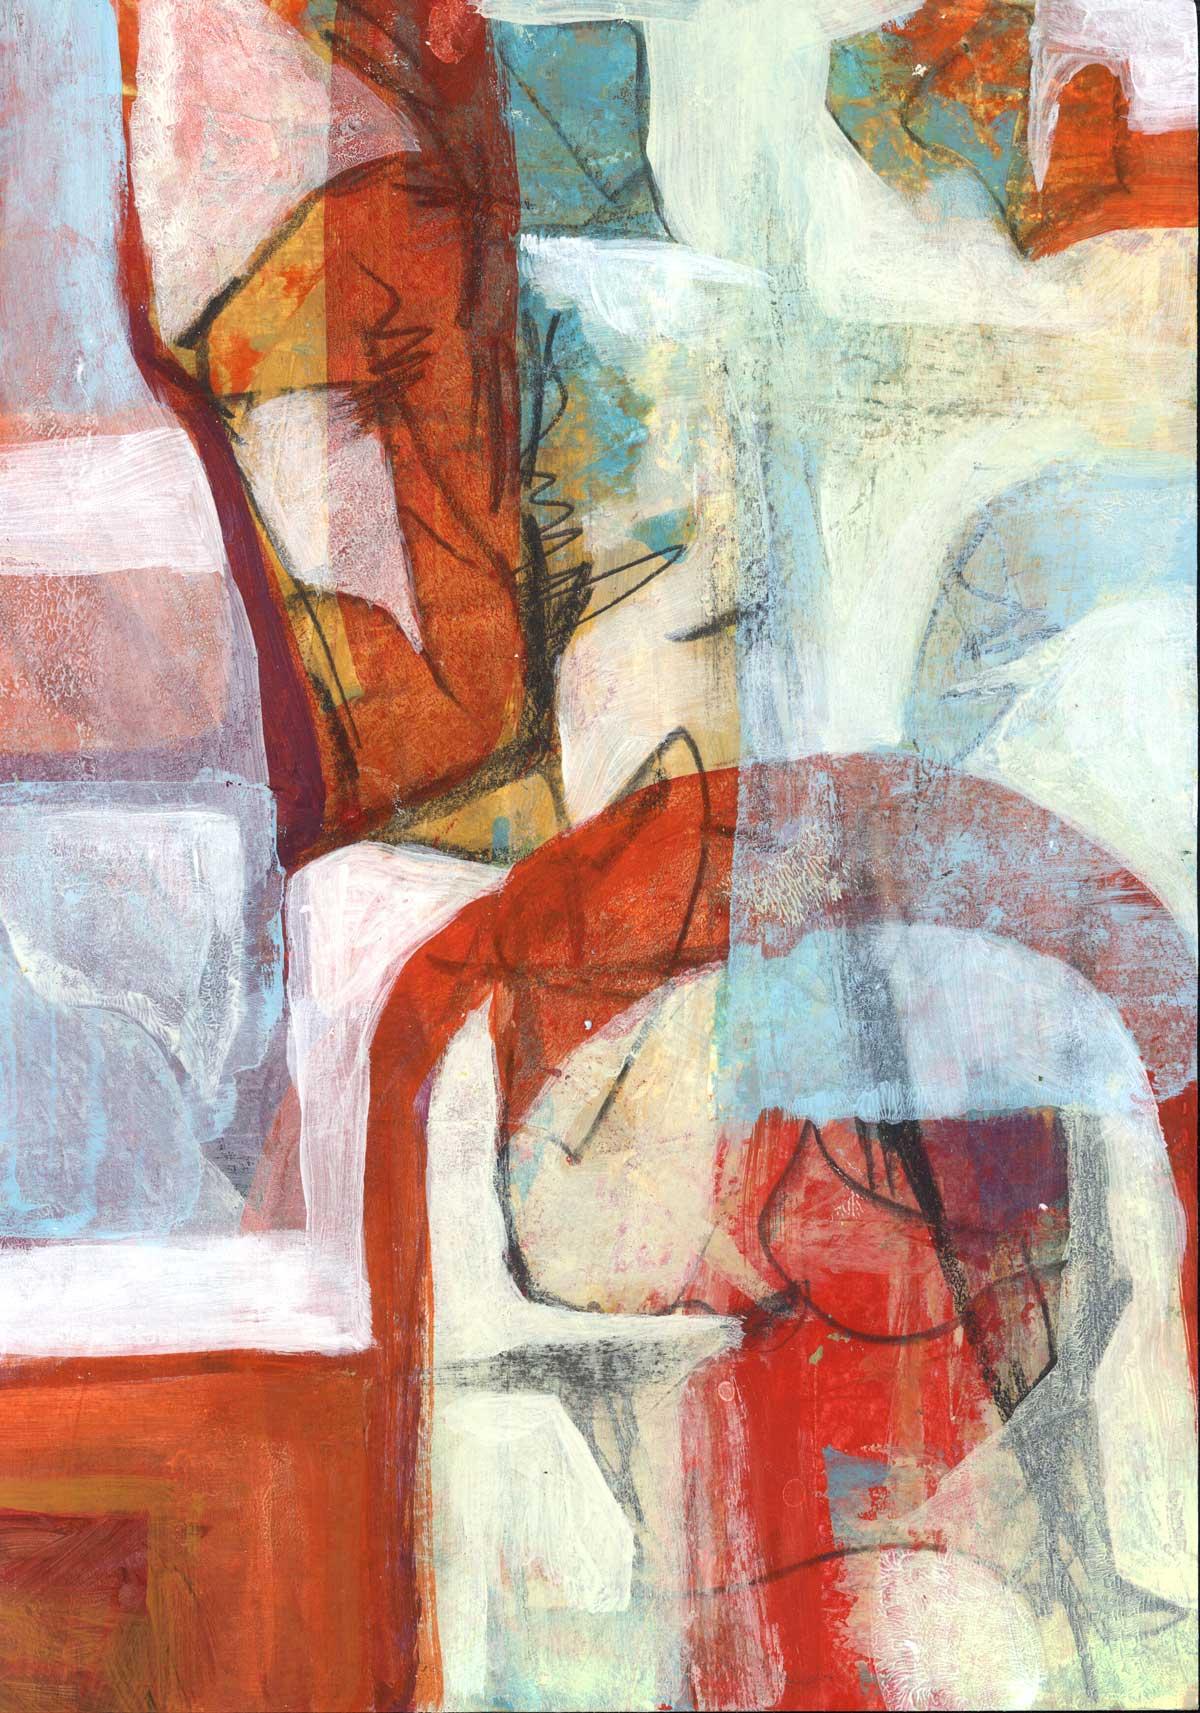 Speed Painting 5 by Janet Jaffke